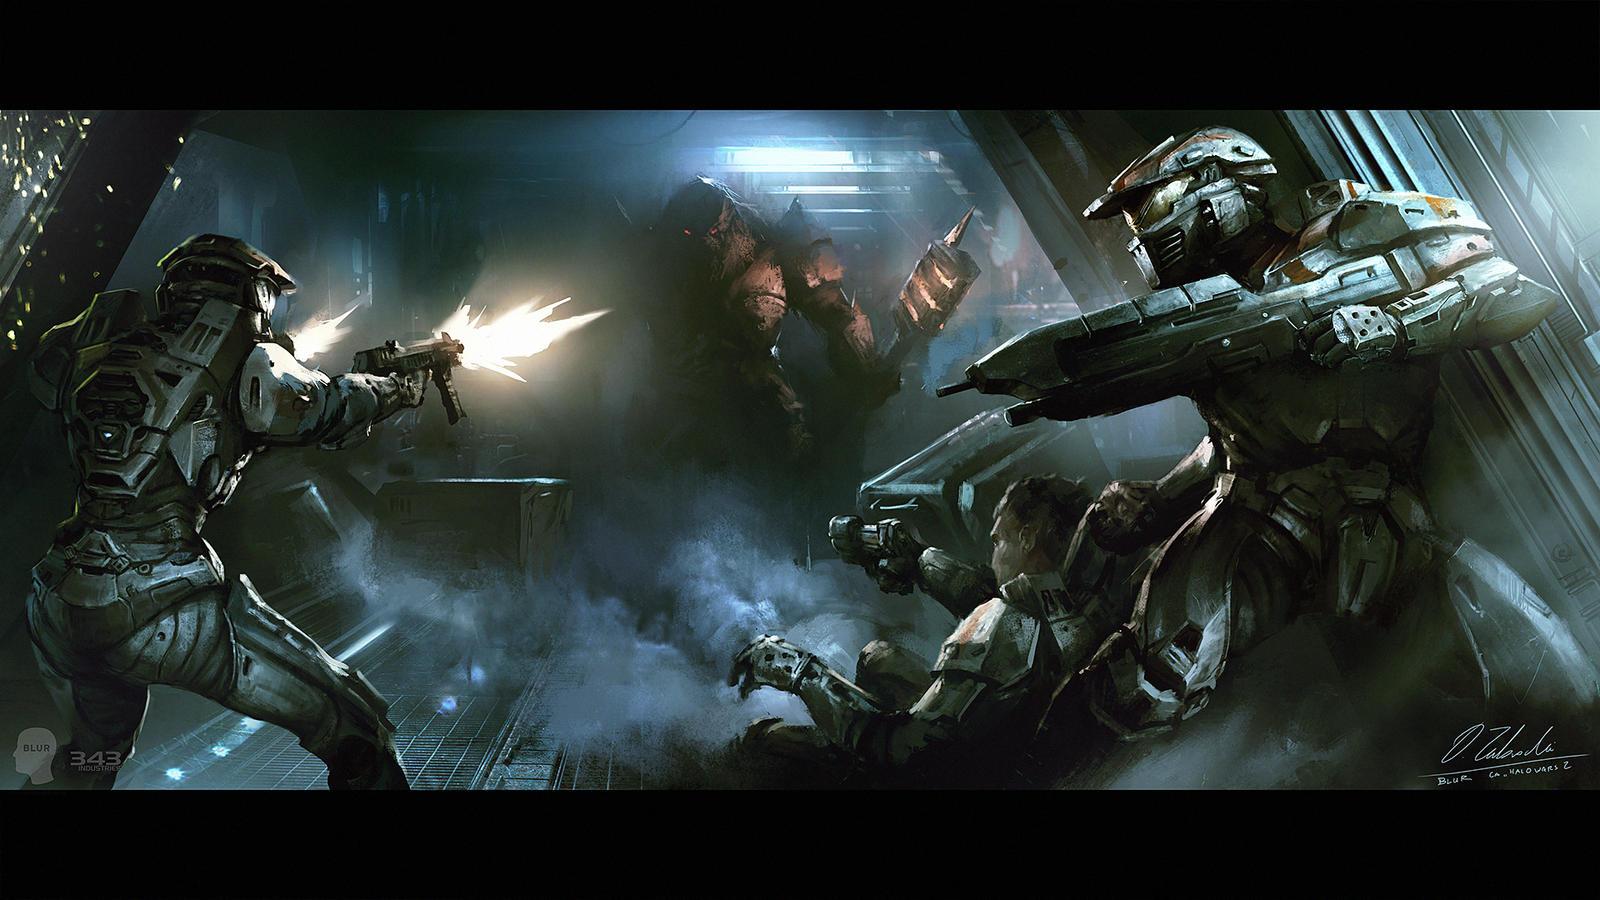 Halo wars 2 trailer escape by daroz on deviantart - Wallpaper halo wars ...